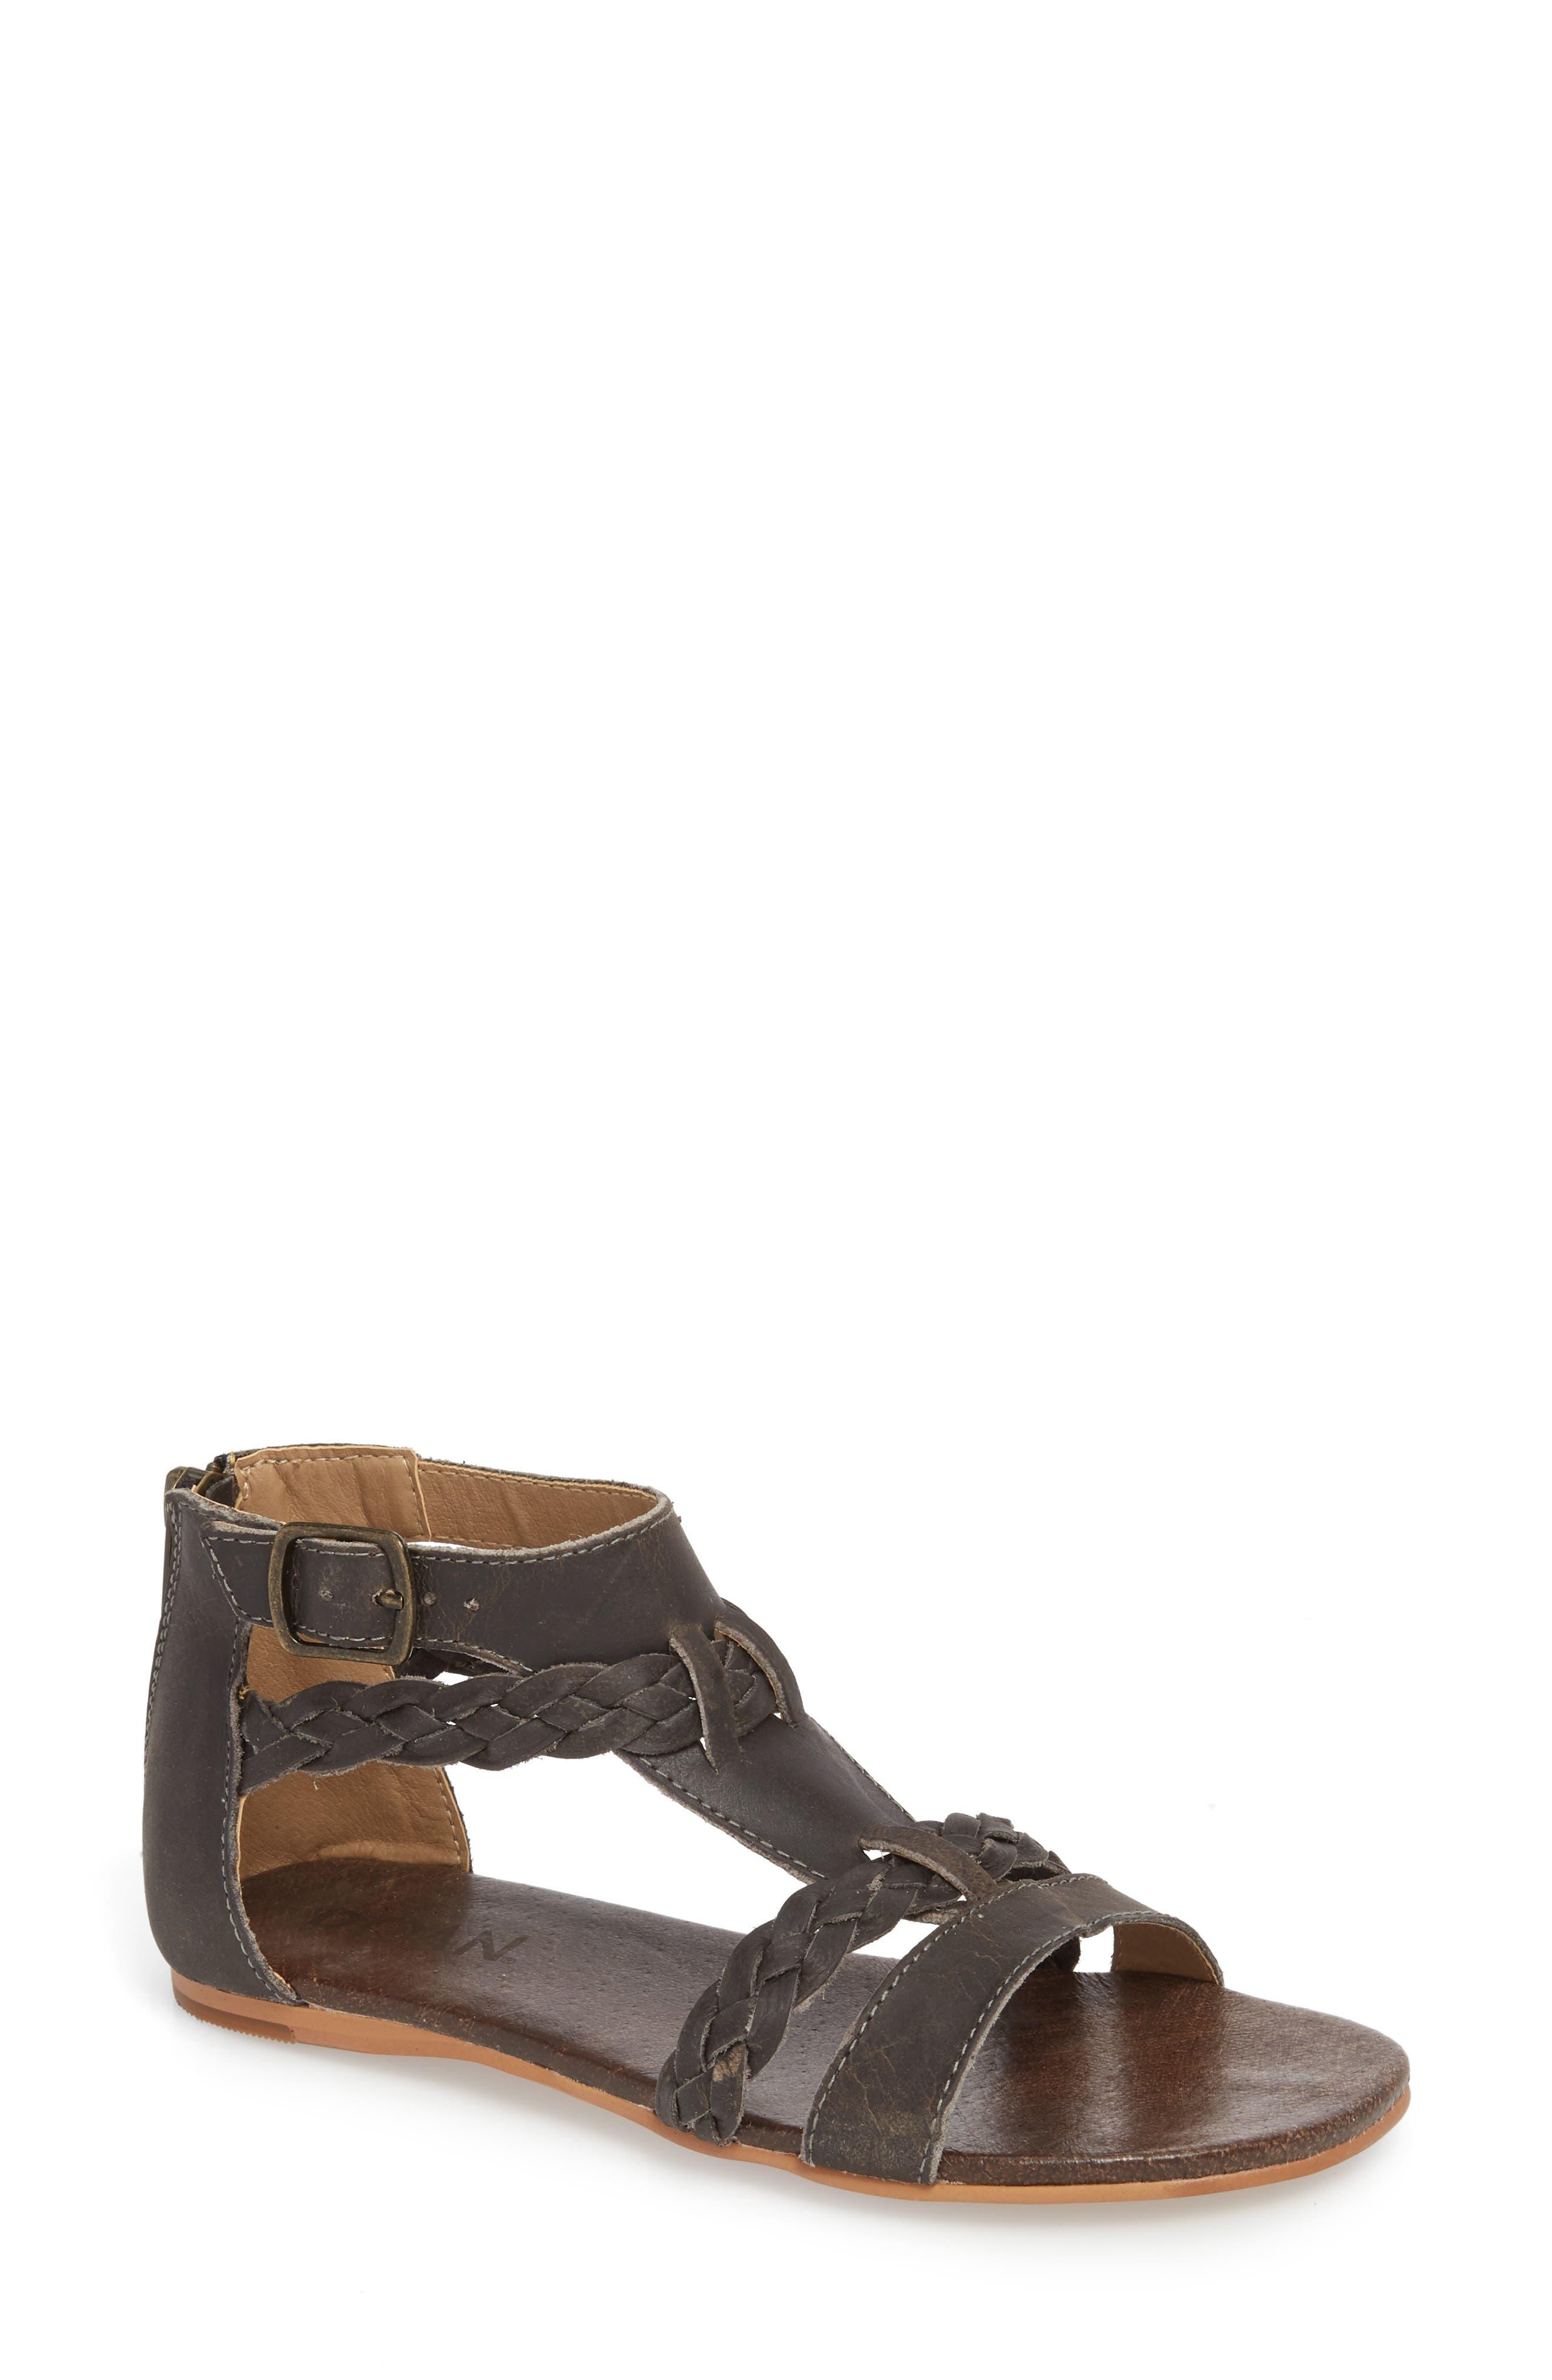 Posey Braided V-Strap Sandal,                         Main,                         color, Sydney Black